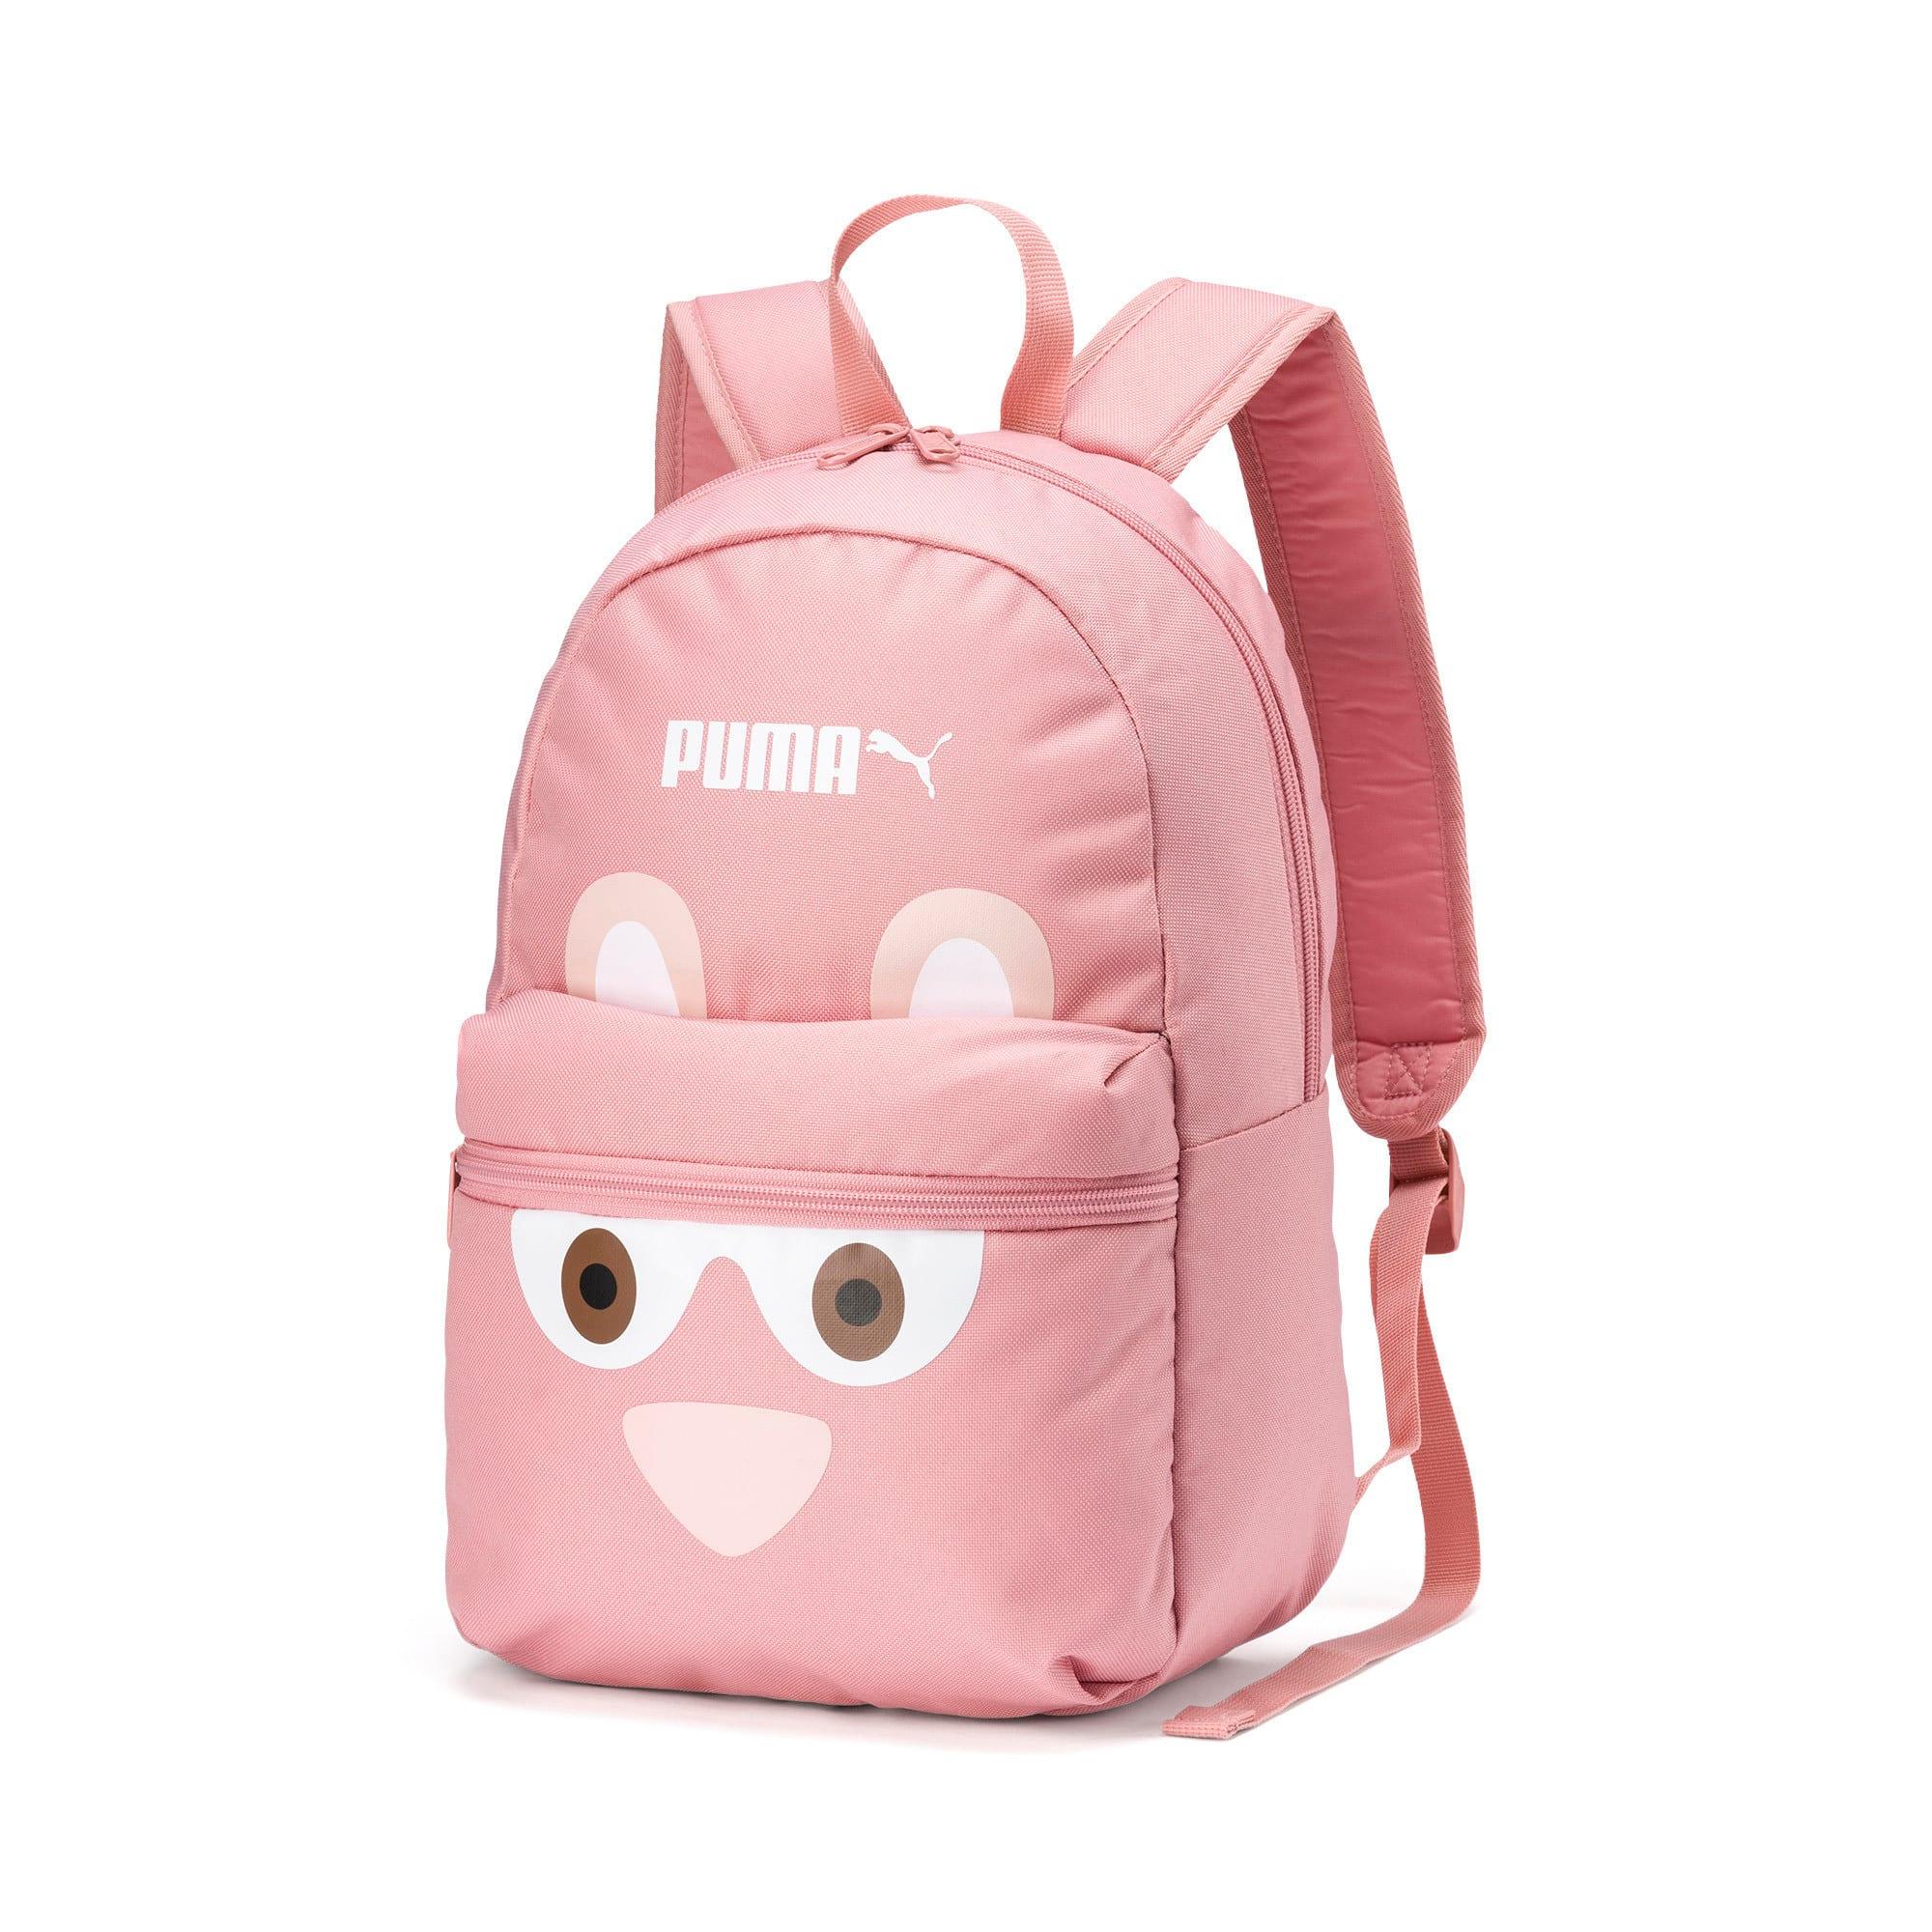 Thumbnail 1 of PUMA Monster Backpack, Bridal Rose, medium